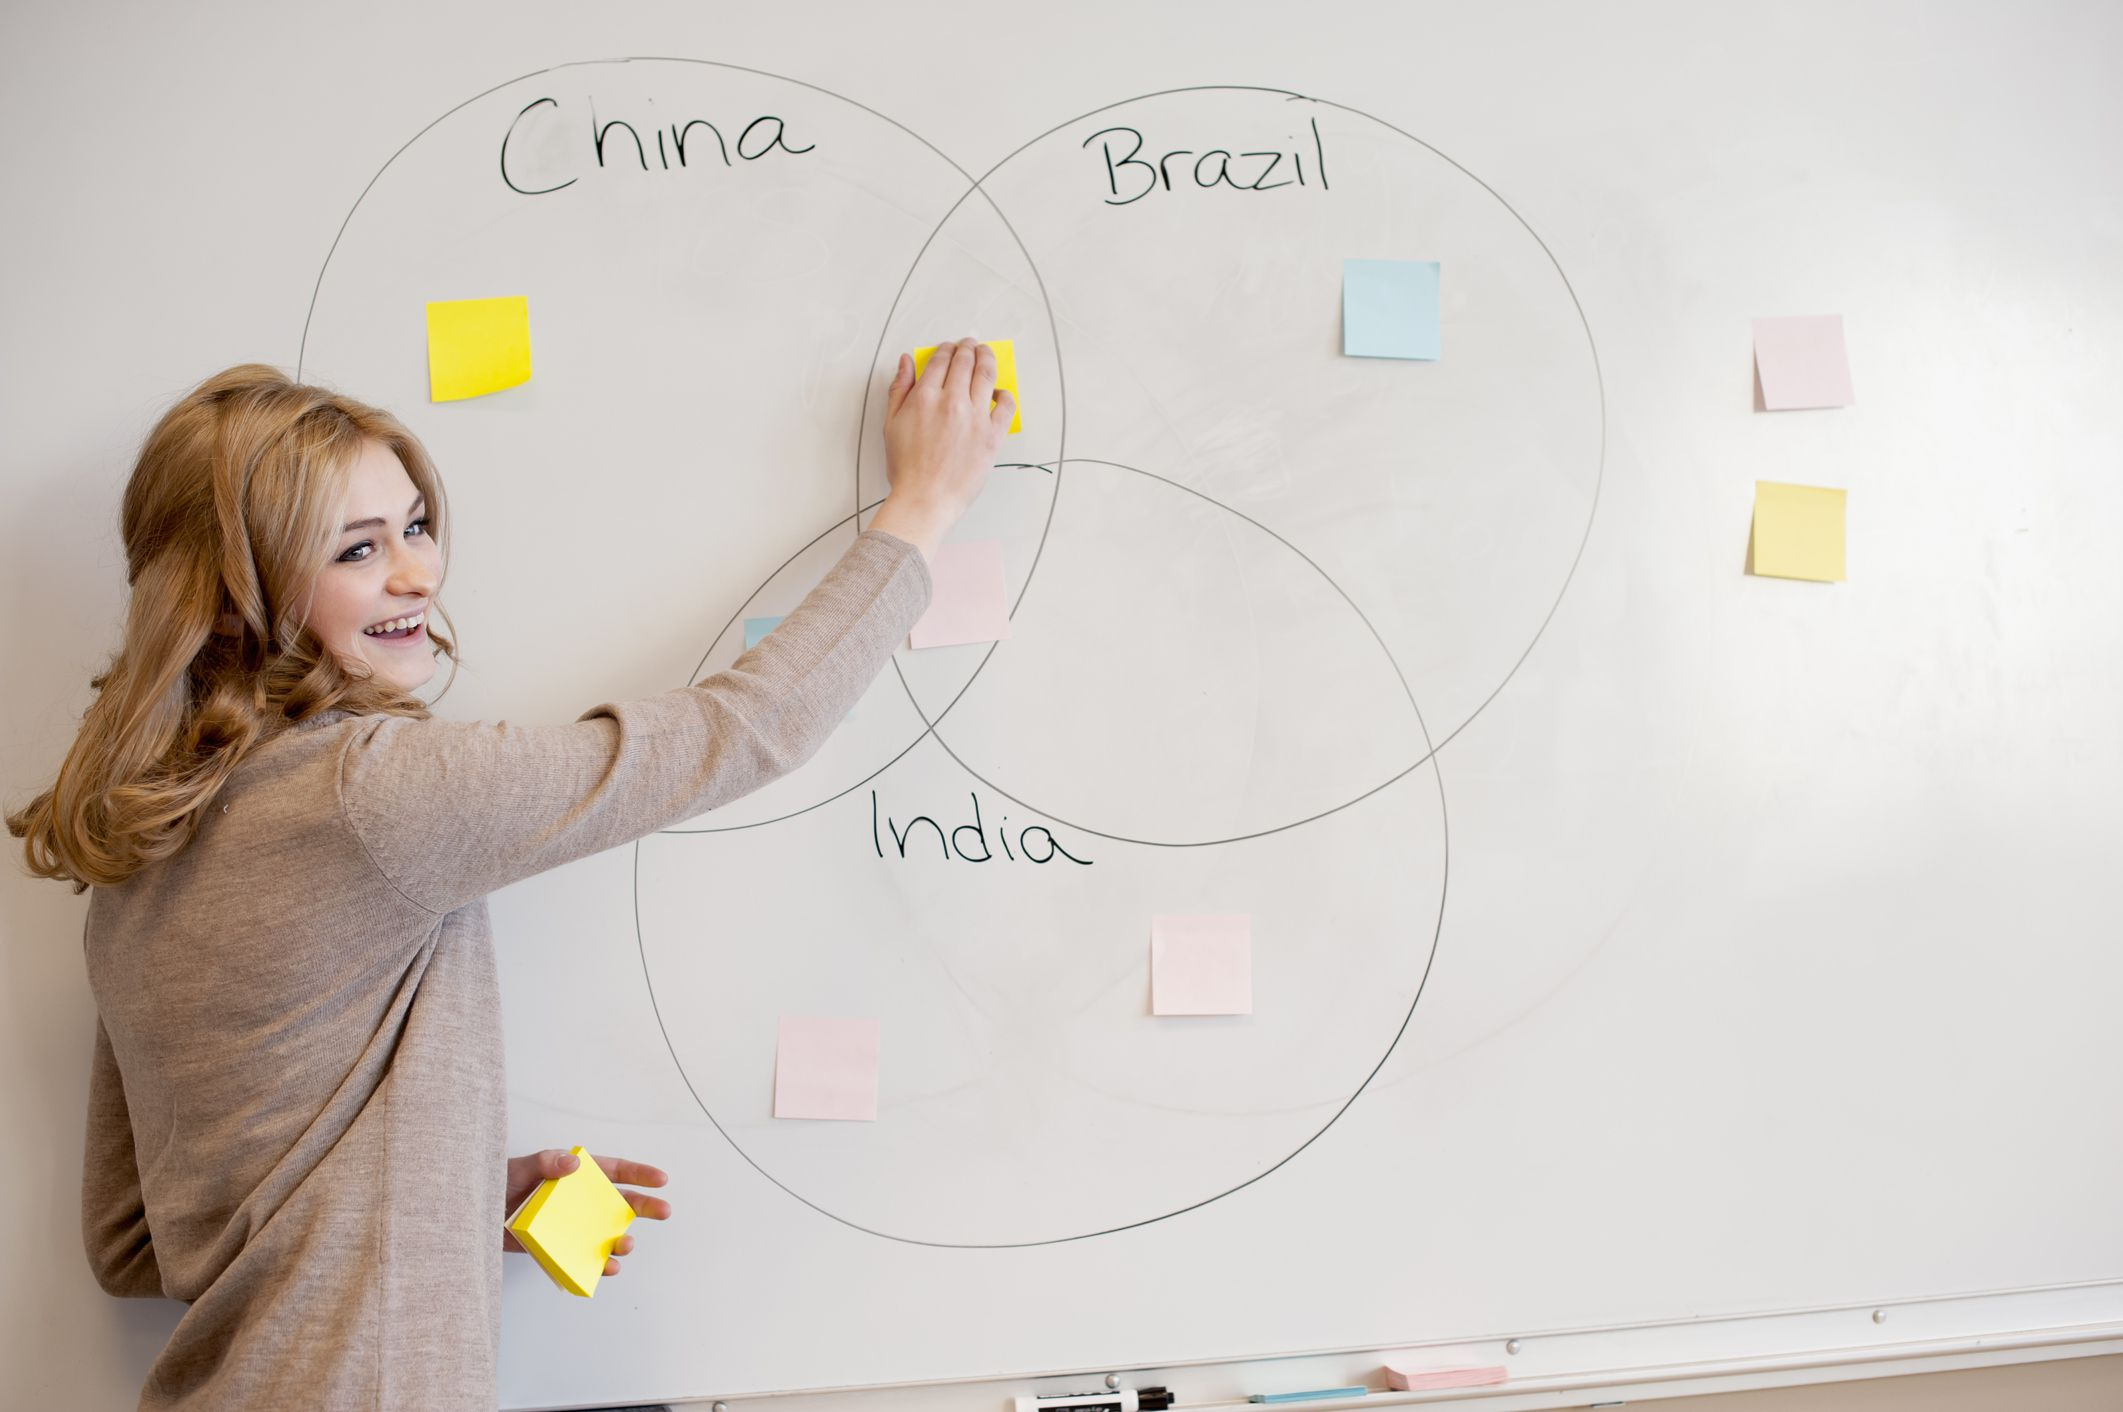 How To Use And Create A Venn Diagram